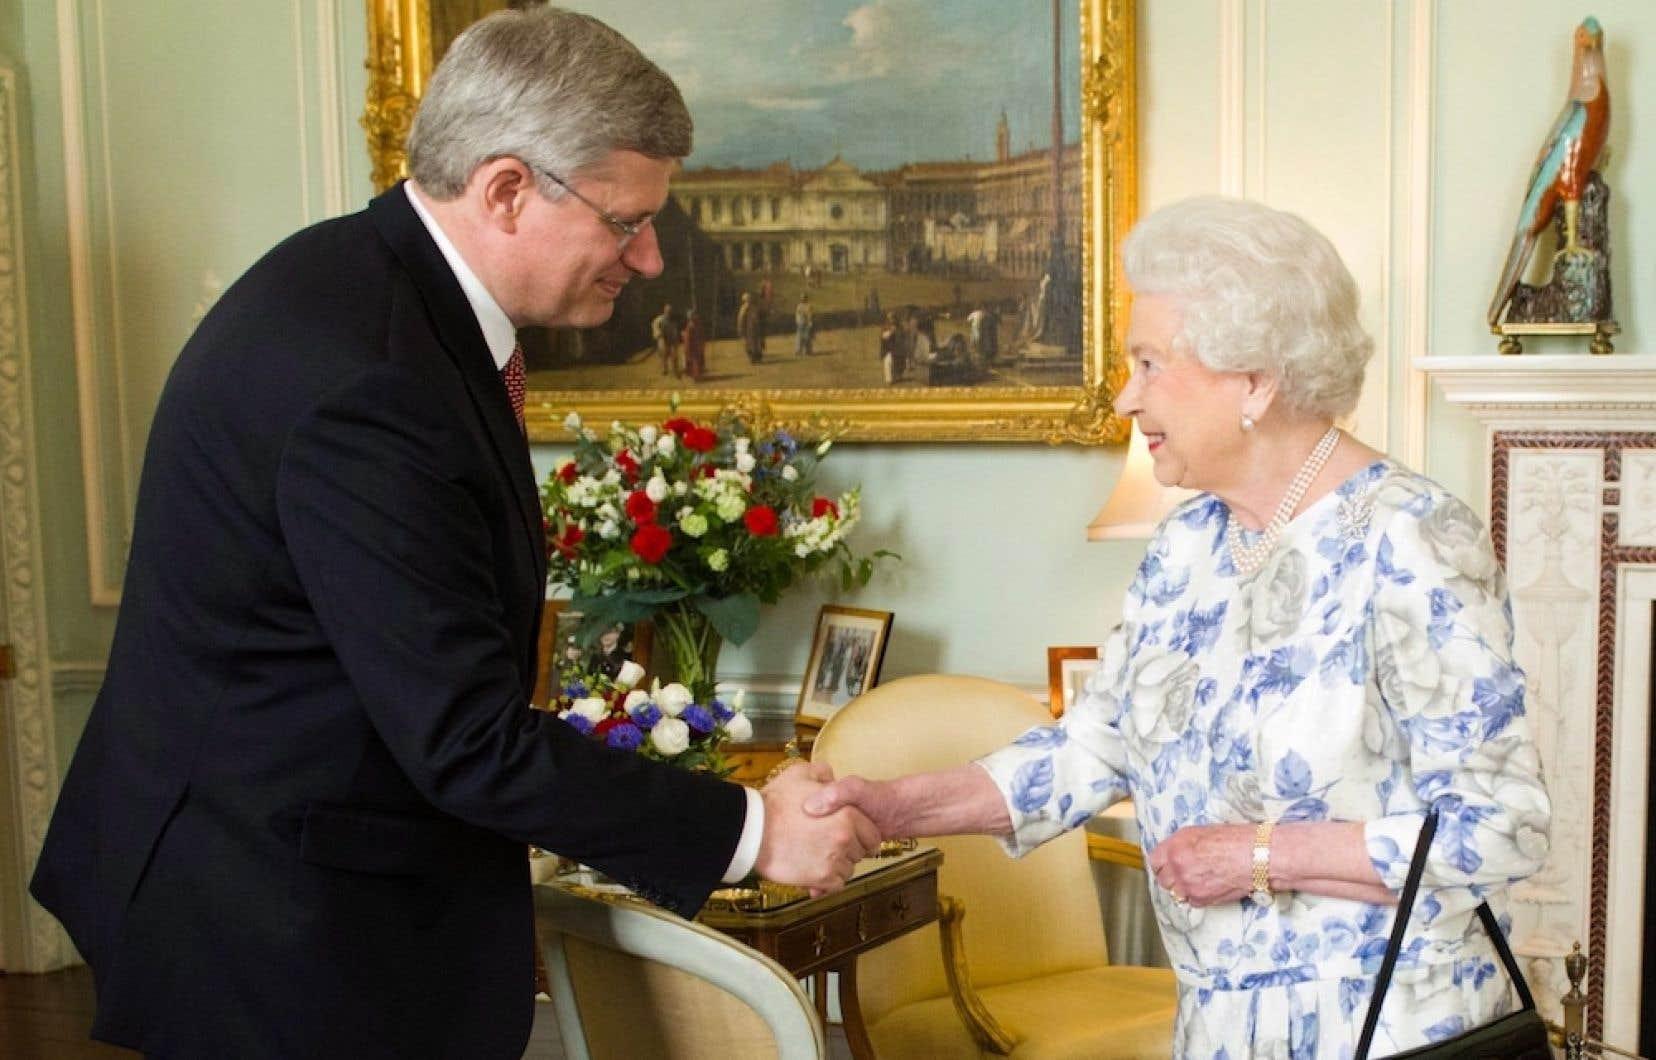 Stephen Harper et la reine Elizabeth II au Palais de Buckingham, en 2012.